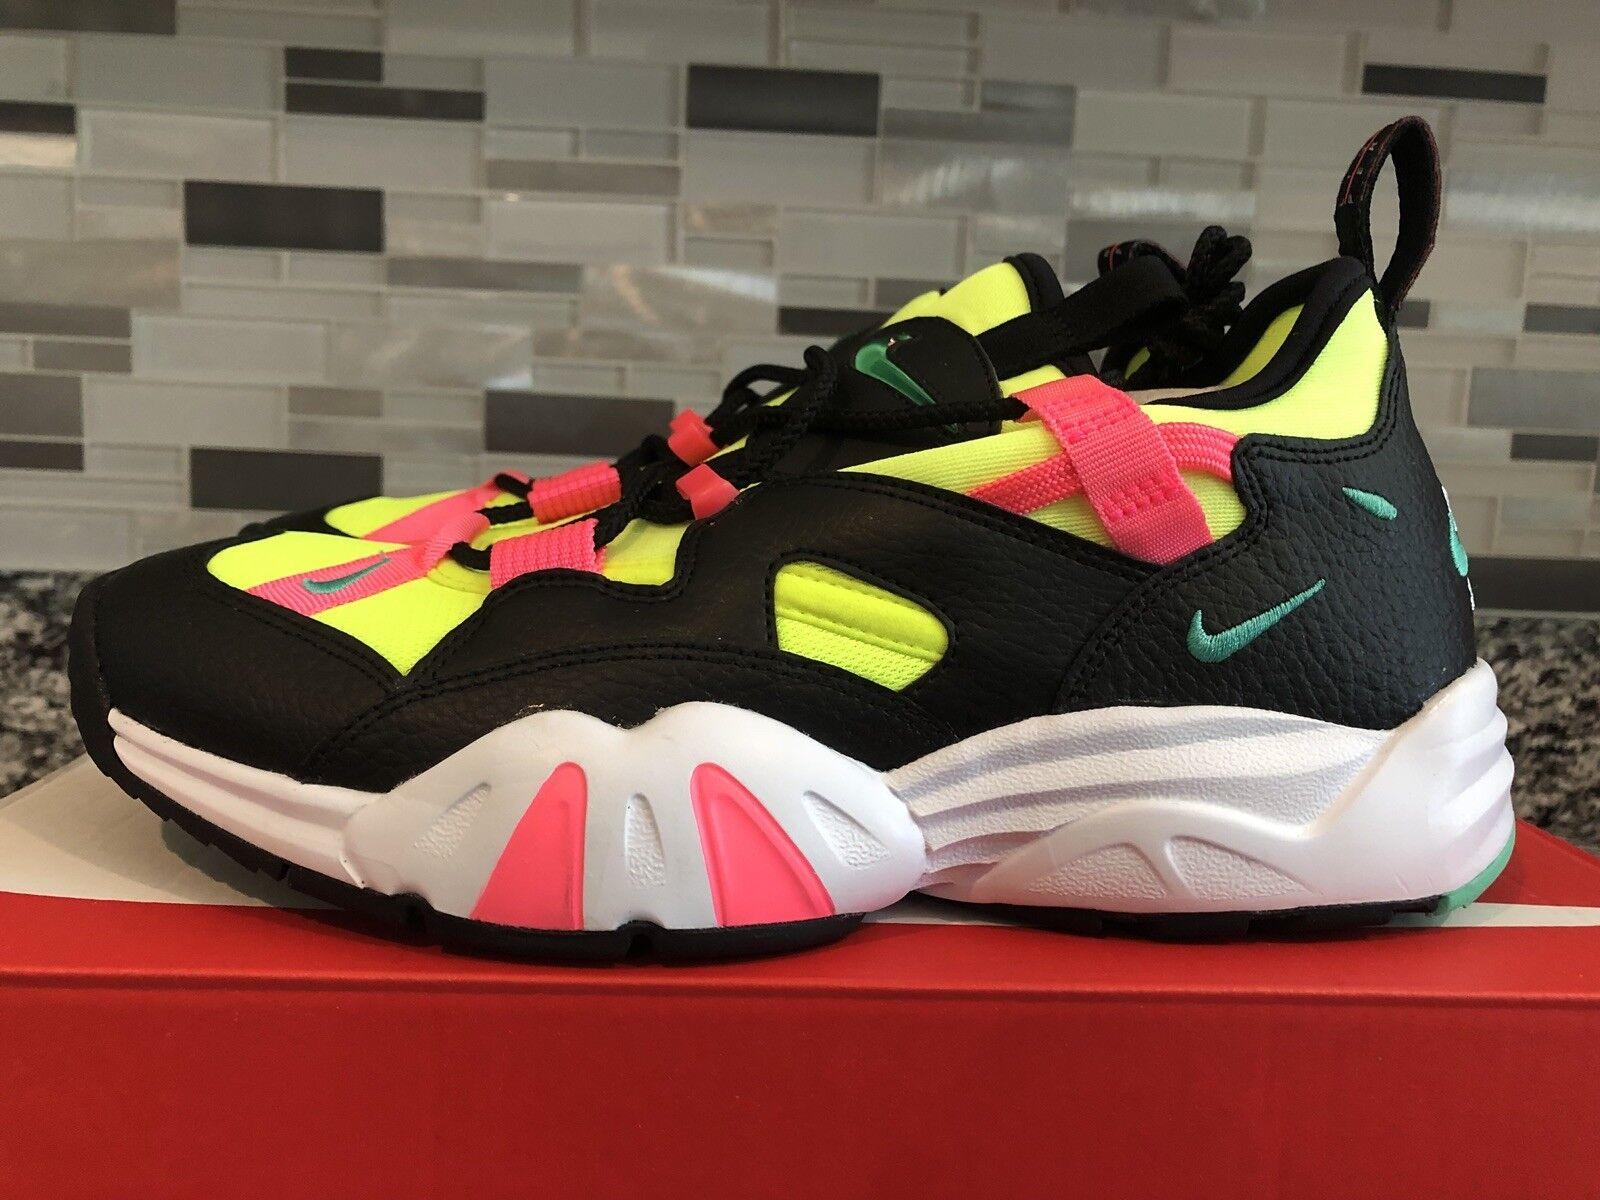 Men's Nike Air Scream LWP SZ 8.5 Training shoes Black Racer Pink Volt AH8517 001